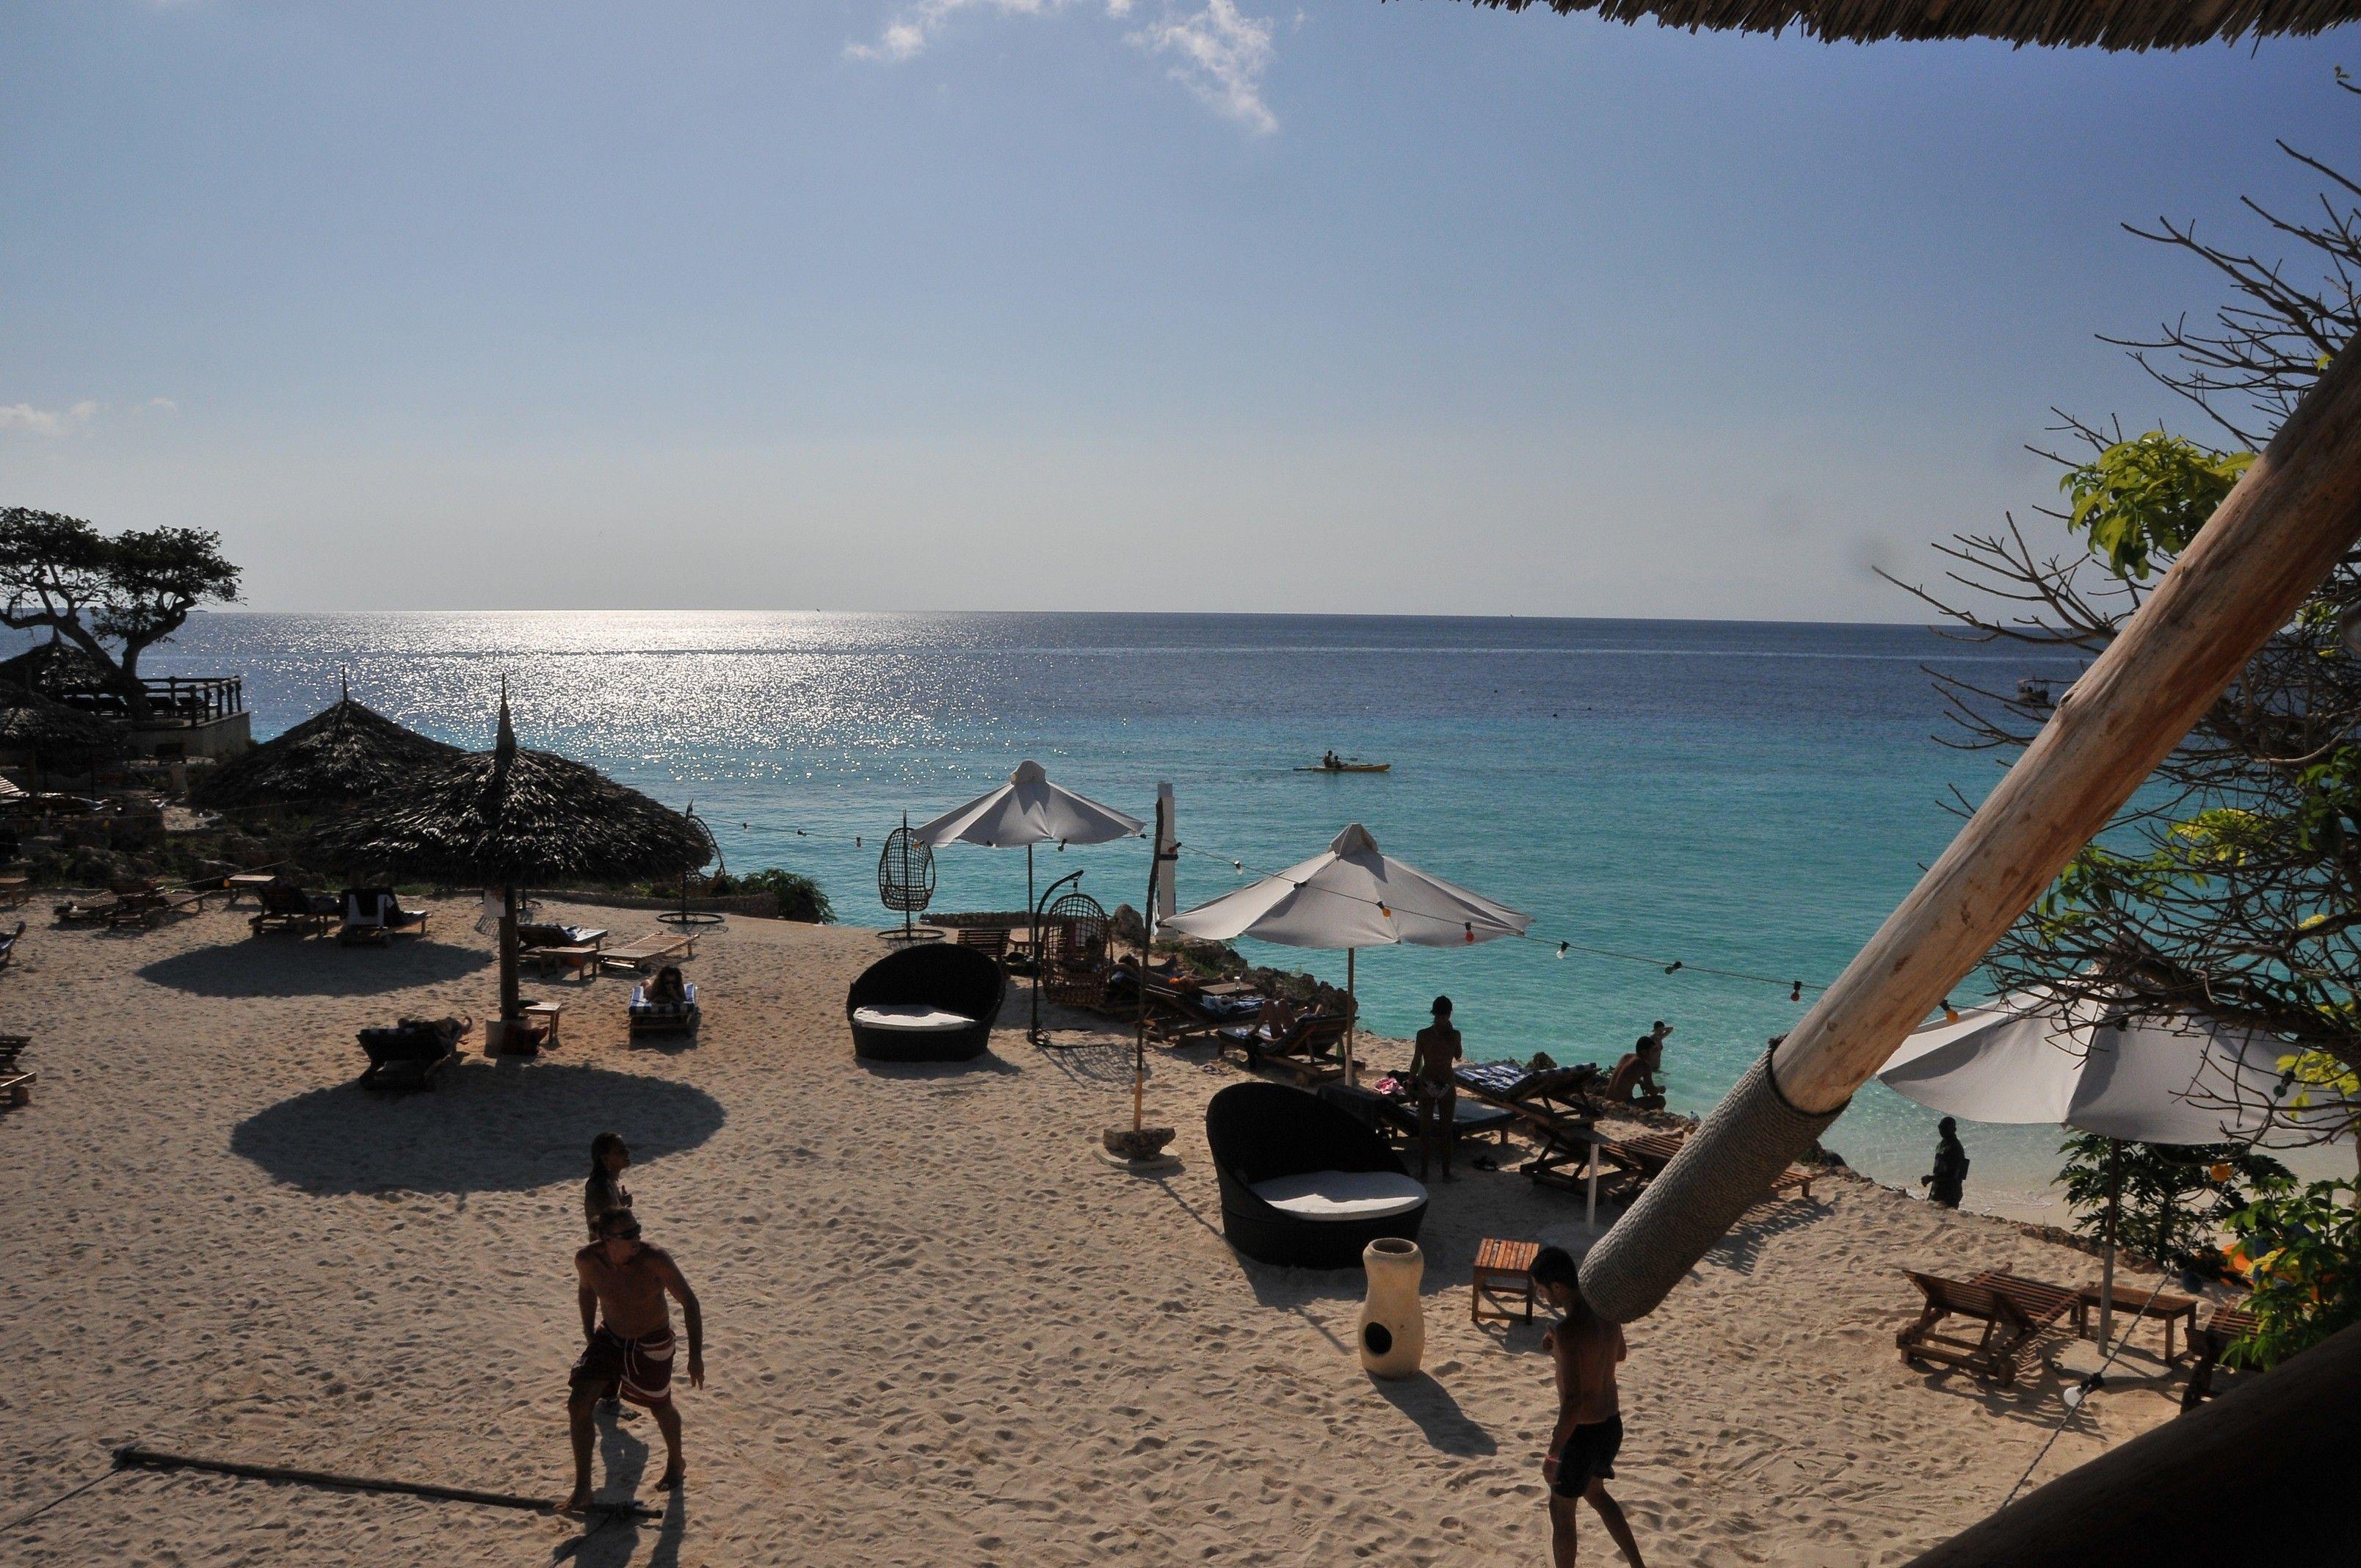 Royal Zanzibar Beach Resort in Nungwi